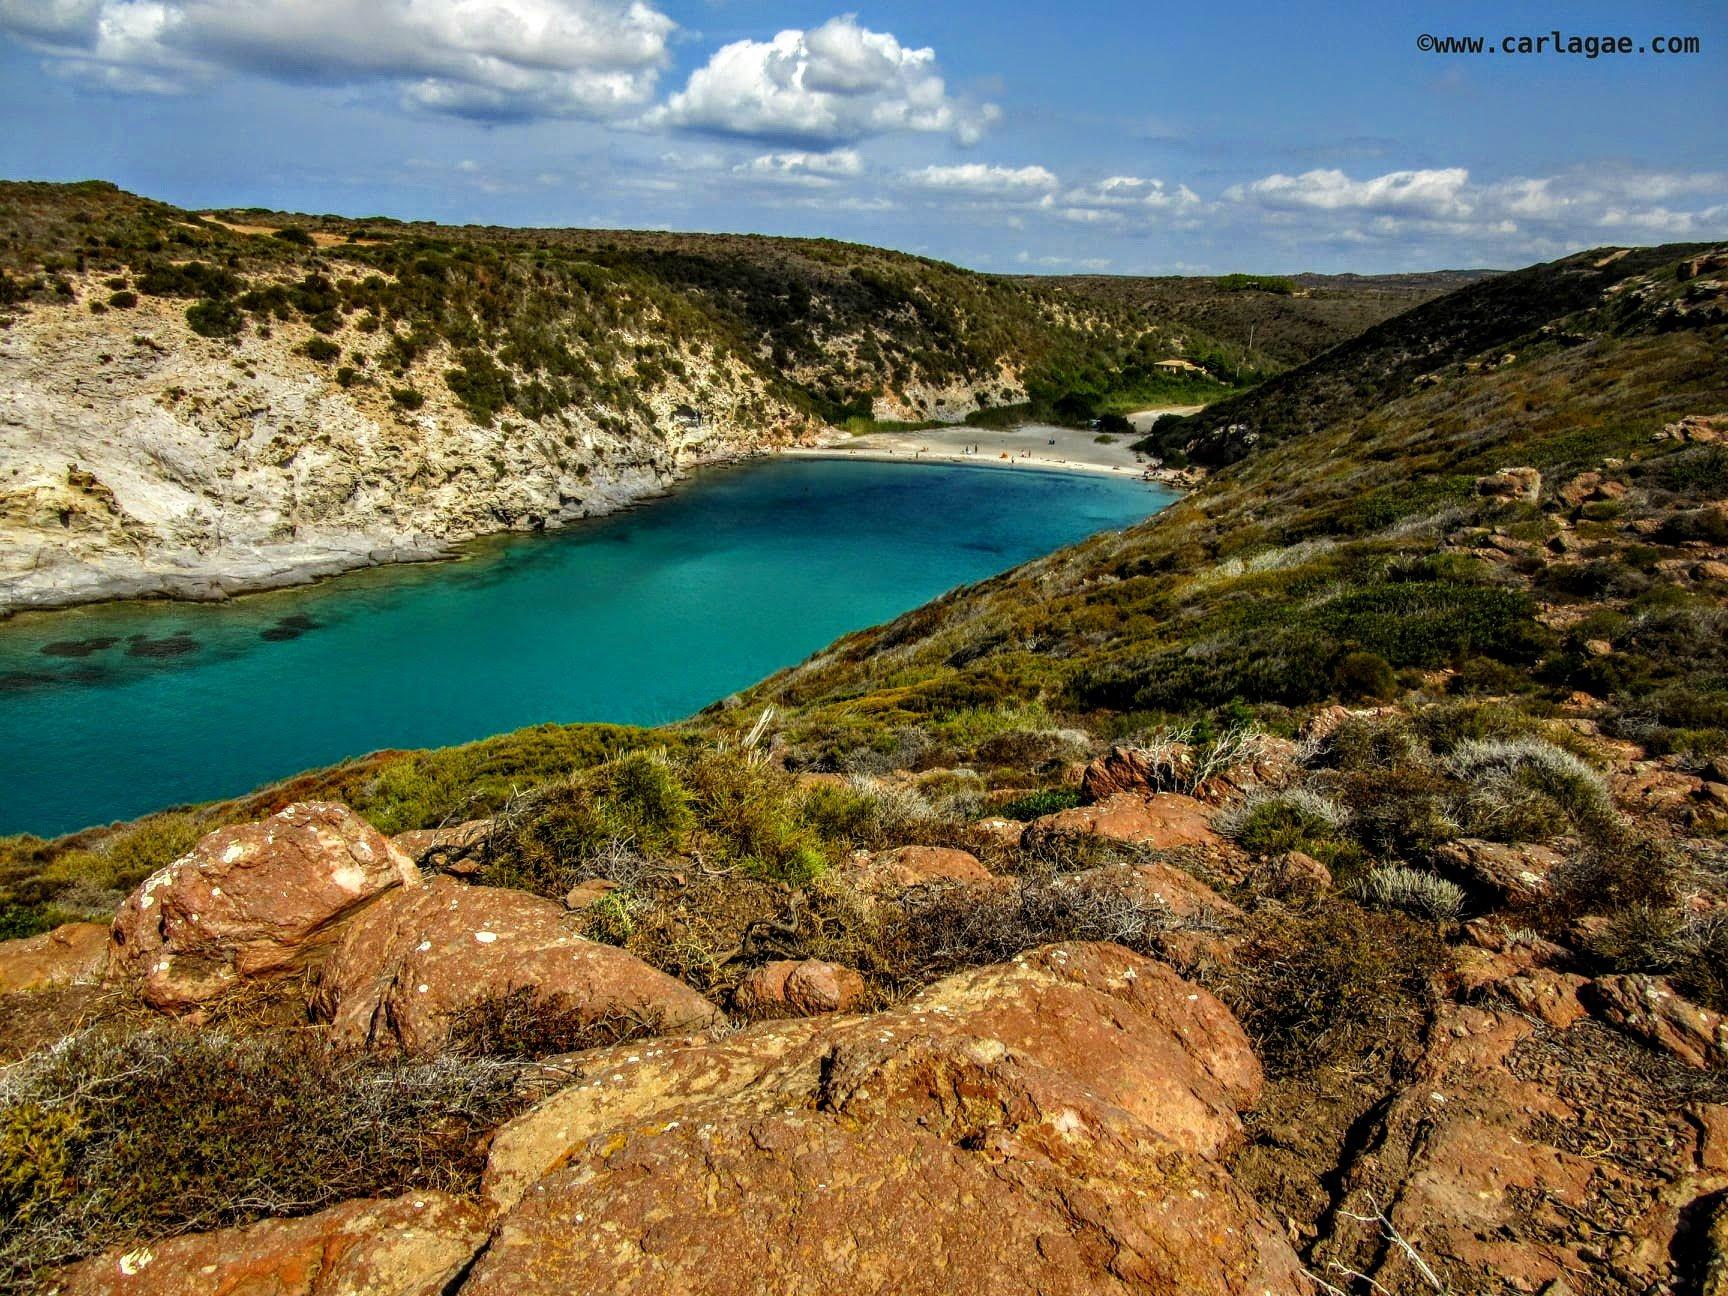 trekking-delle-isole-del-sud-sardegna-cala-lunga